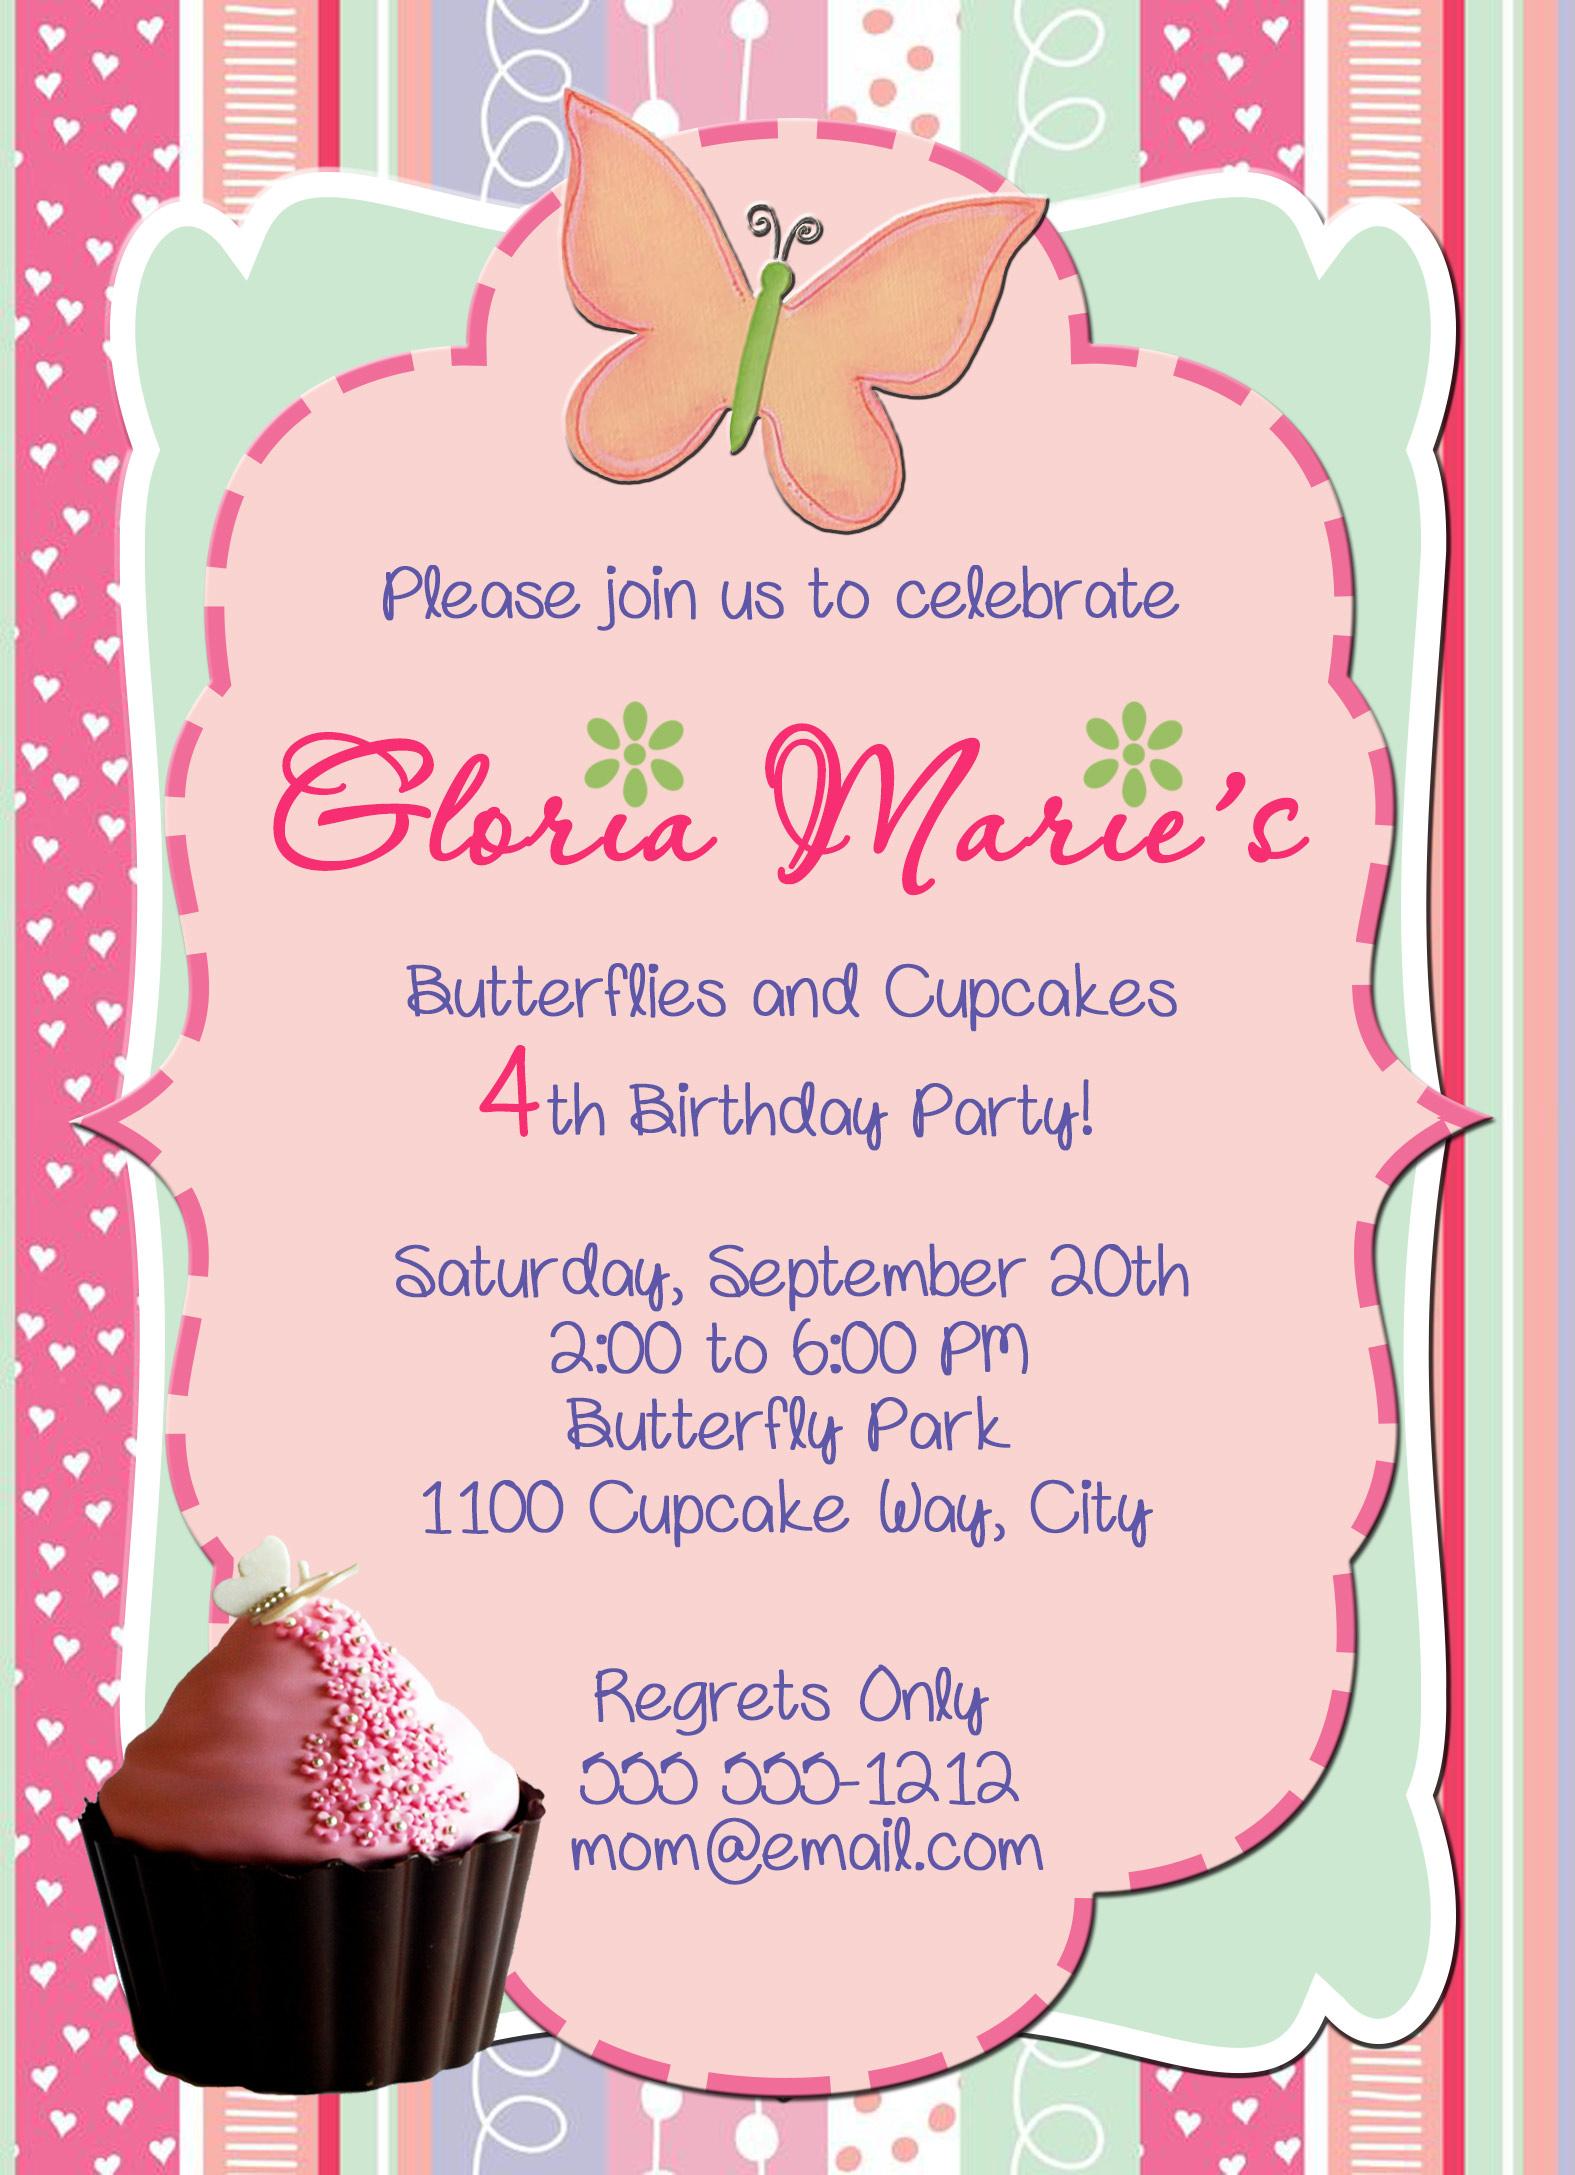 Cupcakes Personalized Birthday Invitation 1 Sided, Birthday Card ...